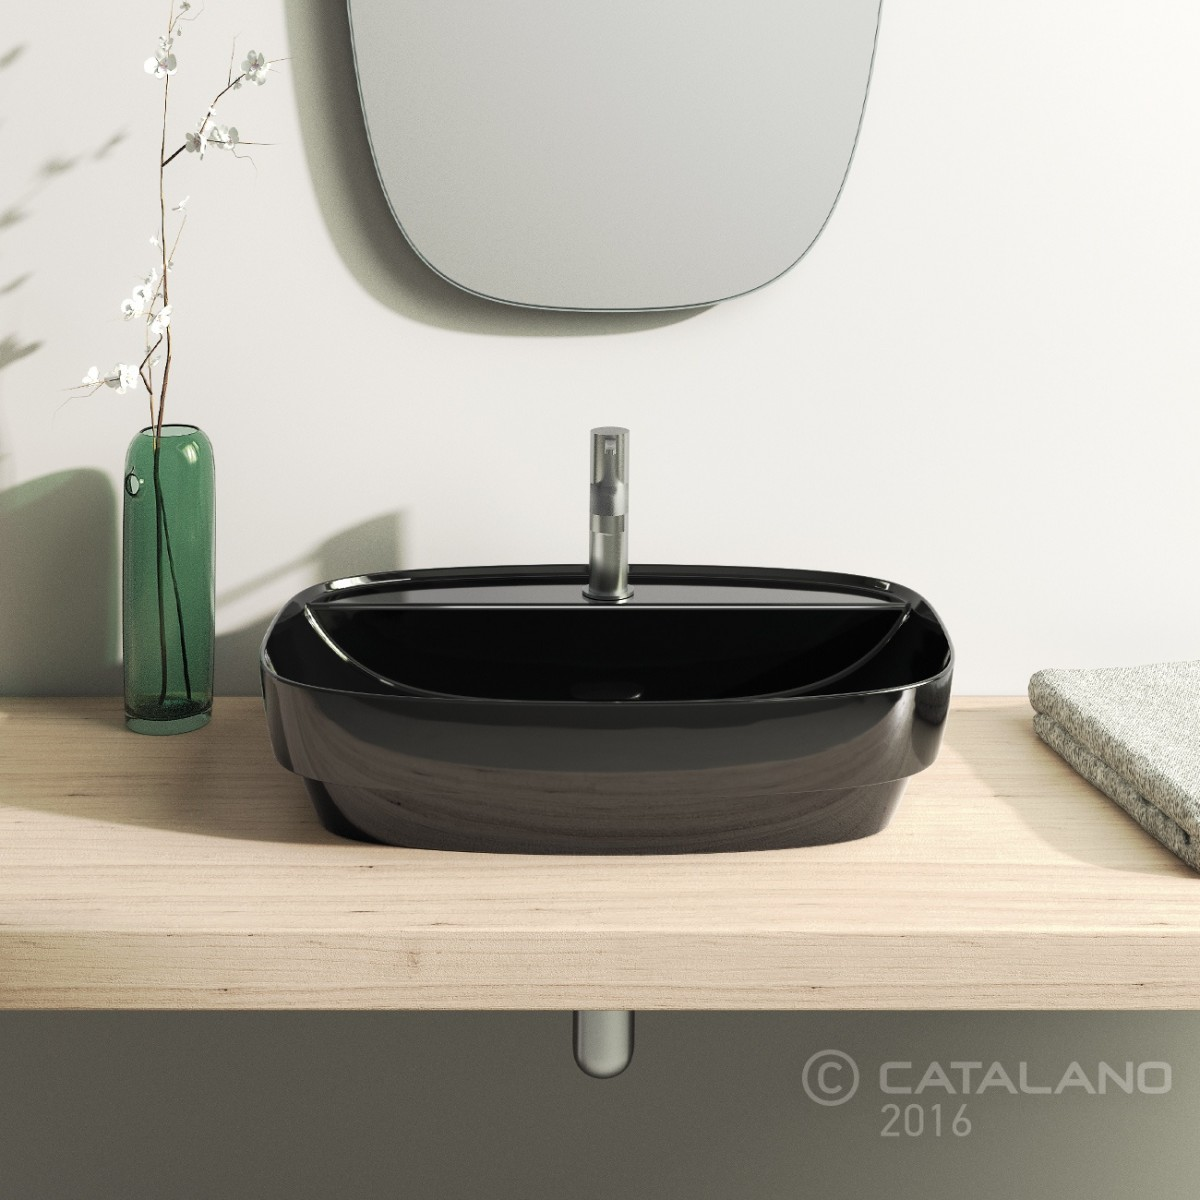 Catalano Colori Green Lux Раковина накладная 60*40, черная